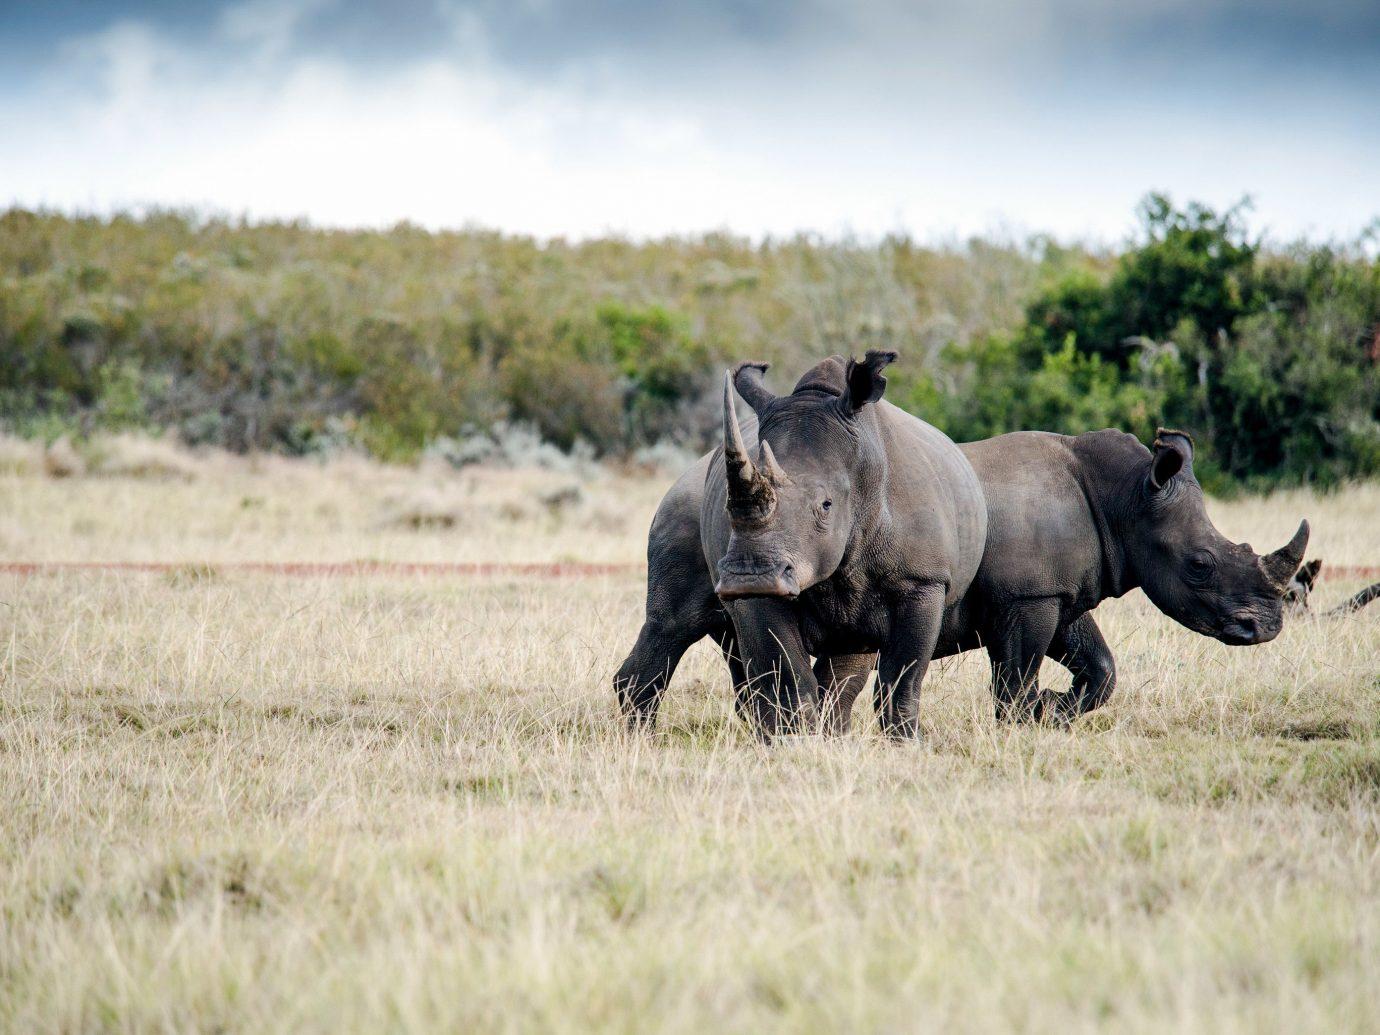 Gondwana Game Reserve; Wildlife grassland ecosystem fauna grass pasture terrestrial animal savanna Safari national park ecoregion steppe grazing mane plain wildebeest landscape shrubland tree prairie sky